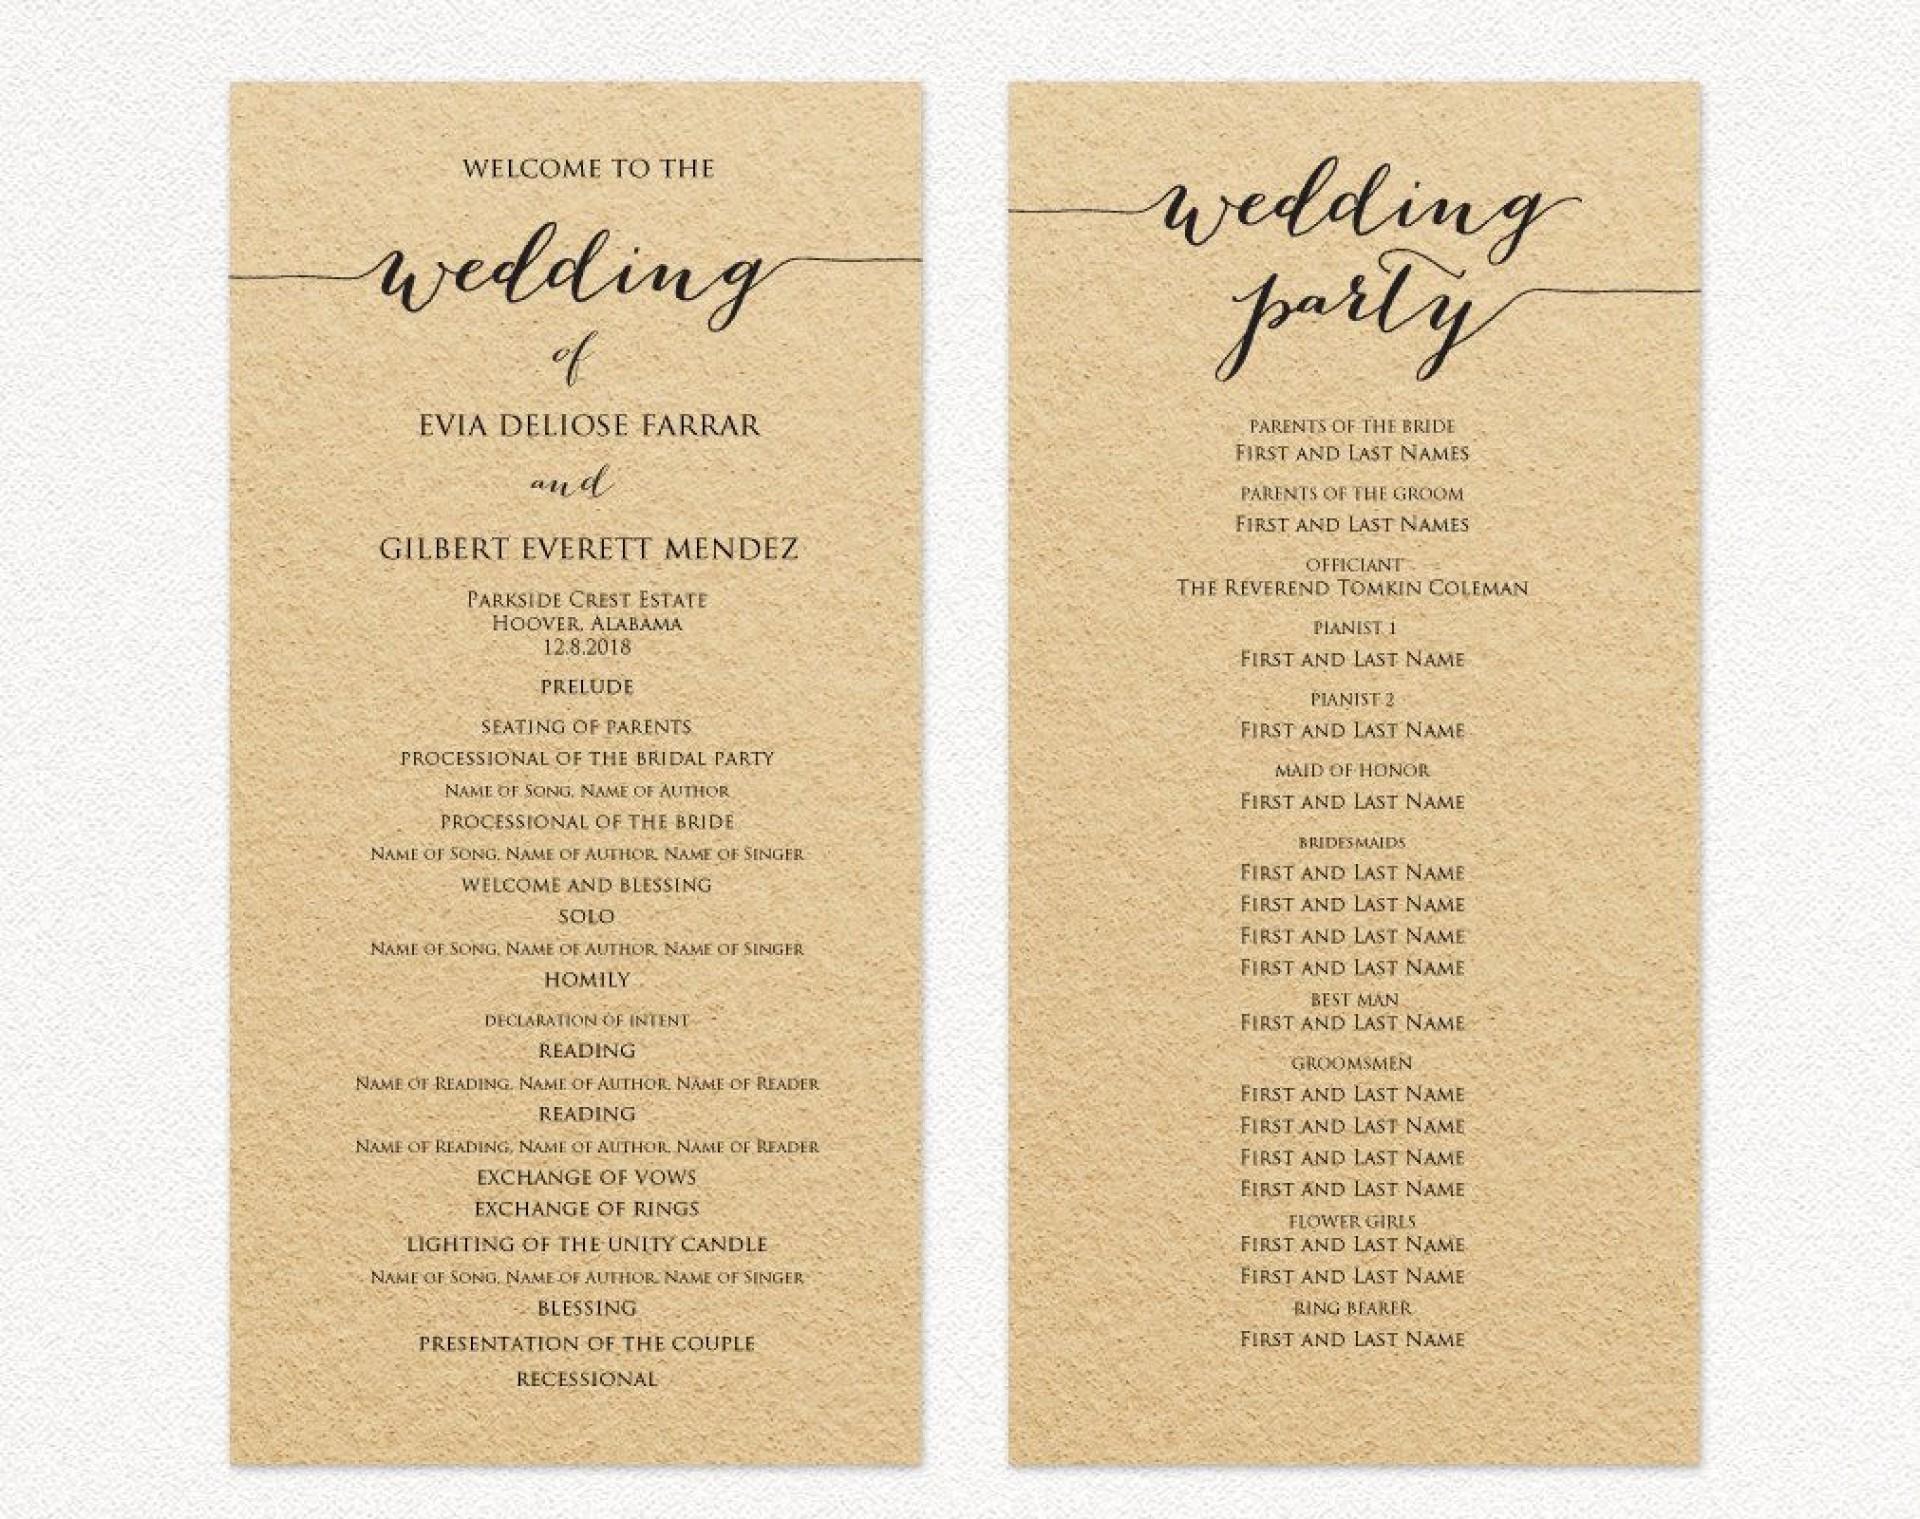 007 Rare Template For Wedding Program Example  Word Free Catholic1920